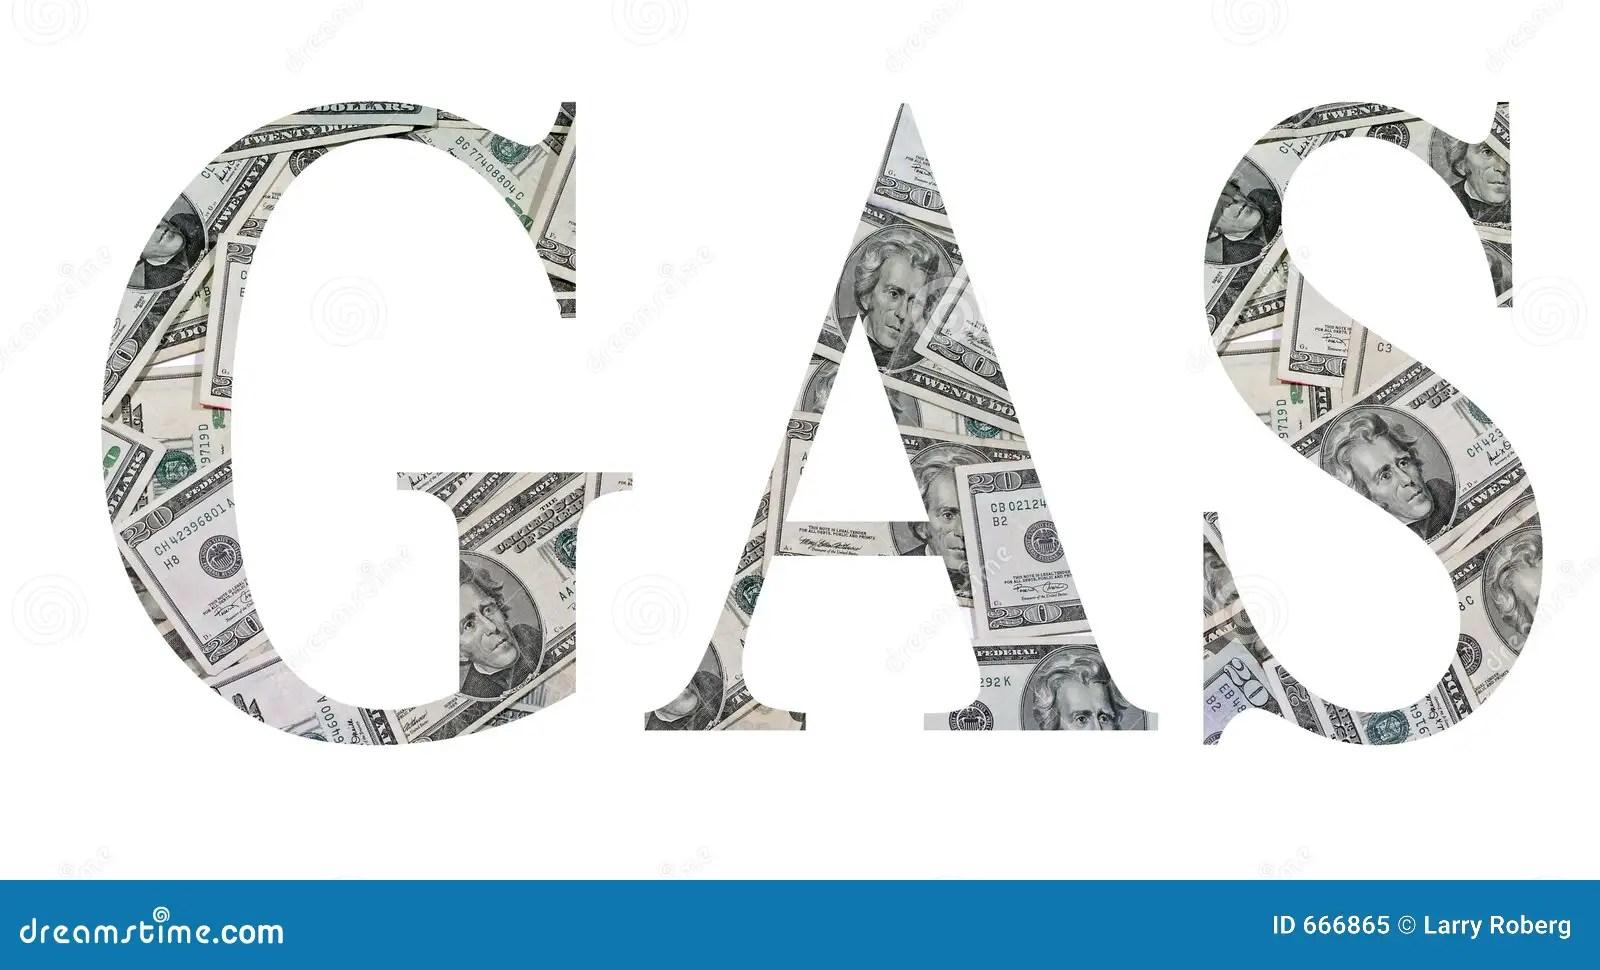 Gas money stock illustration. Illustration of twenty